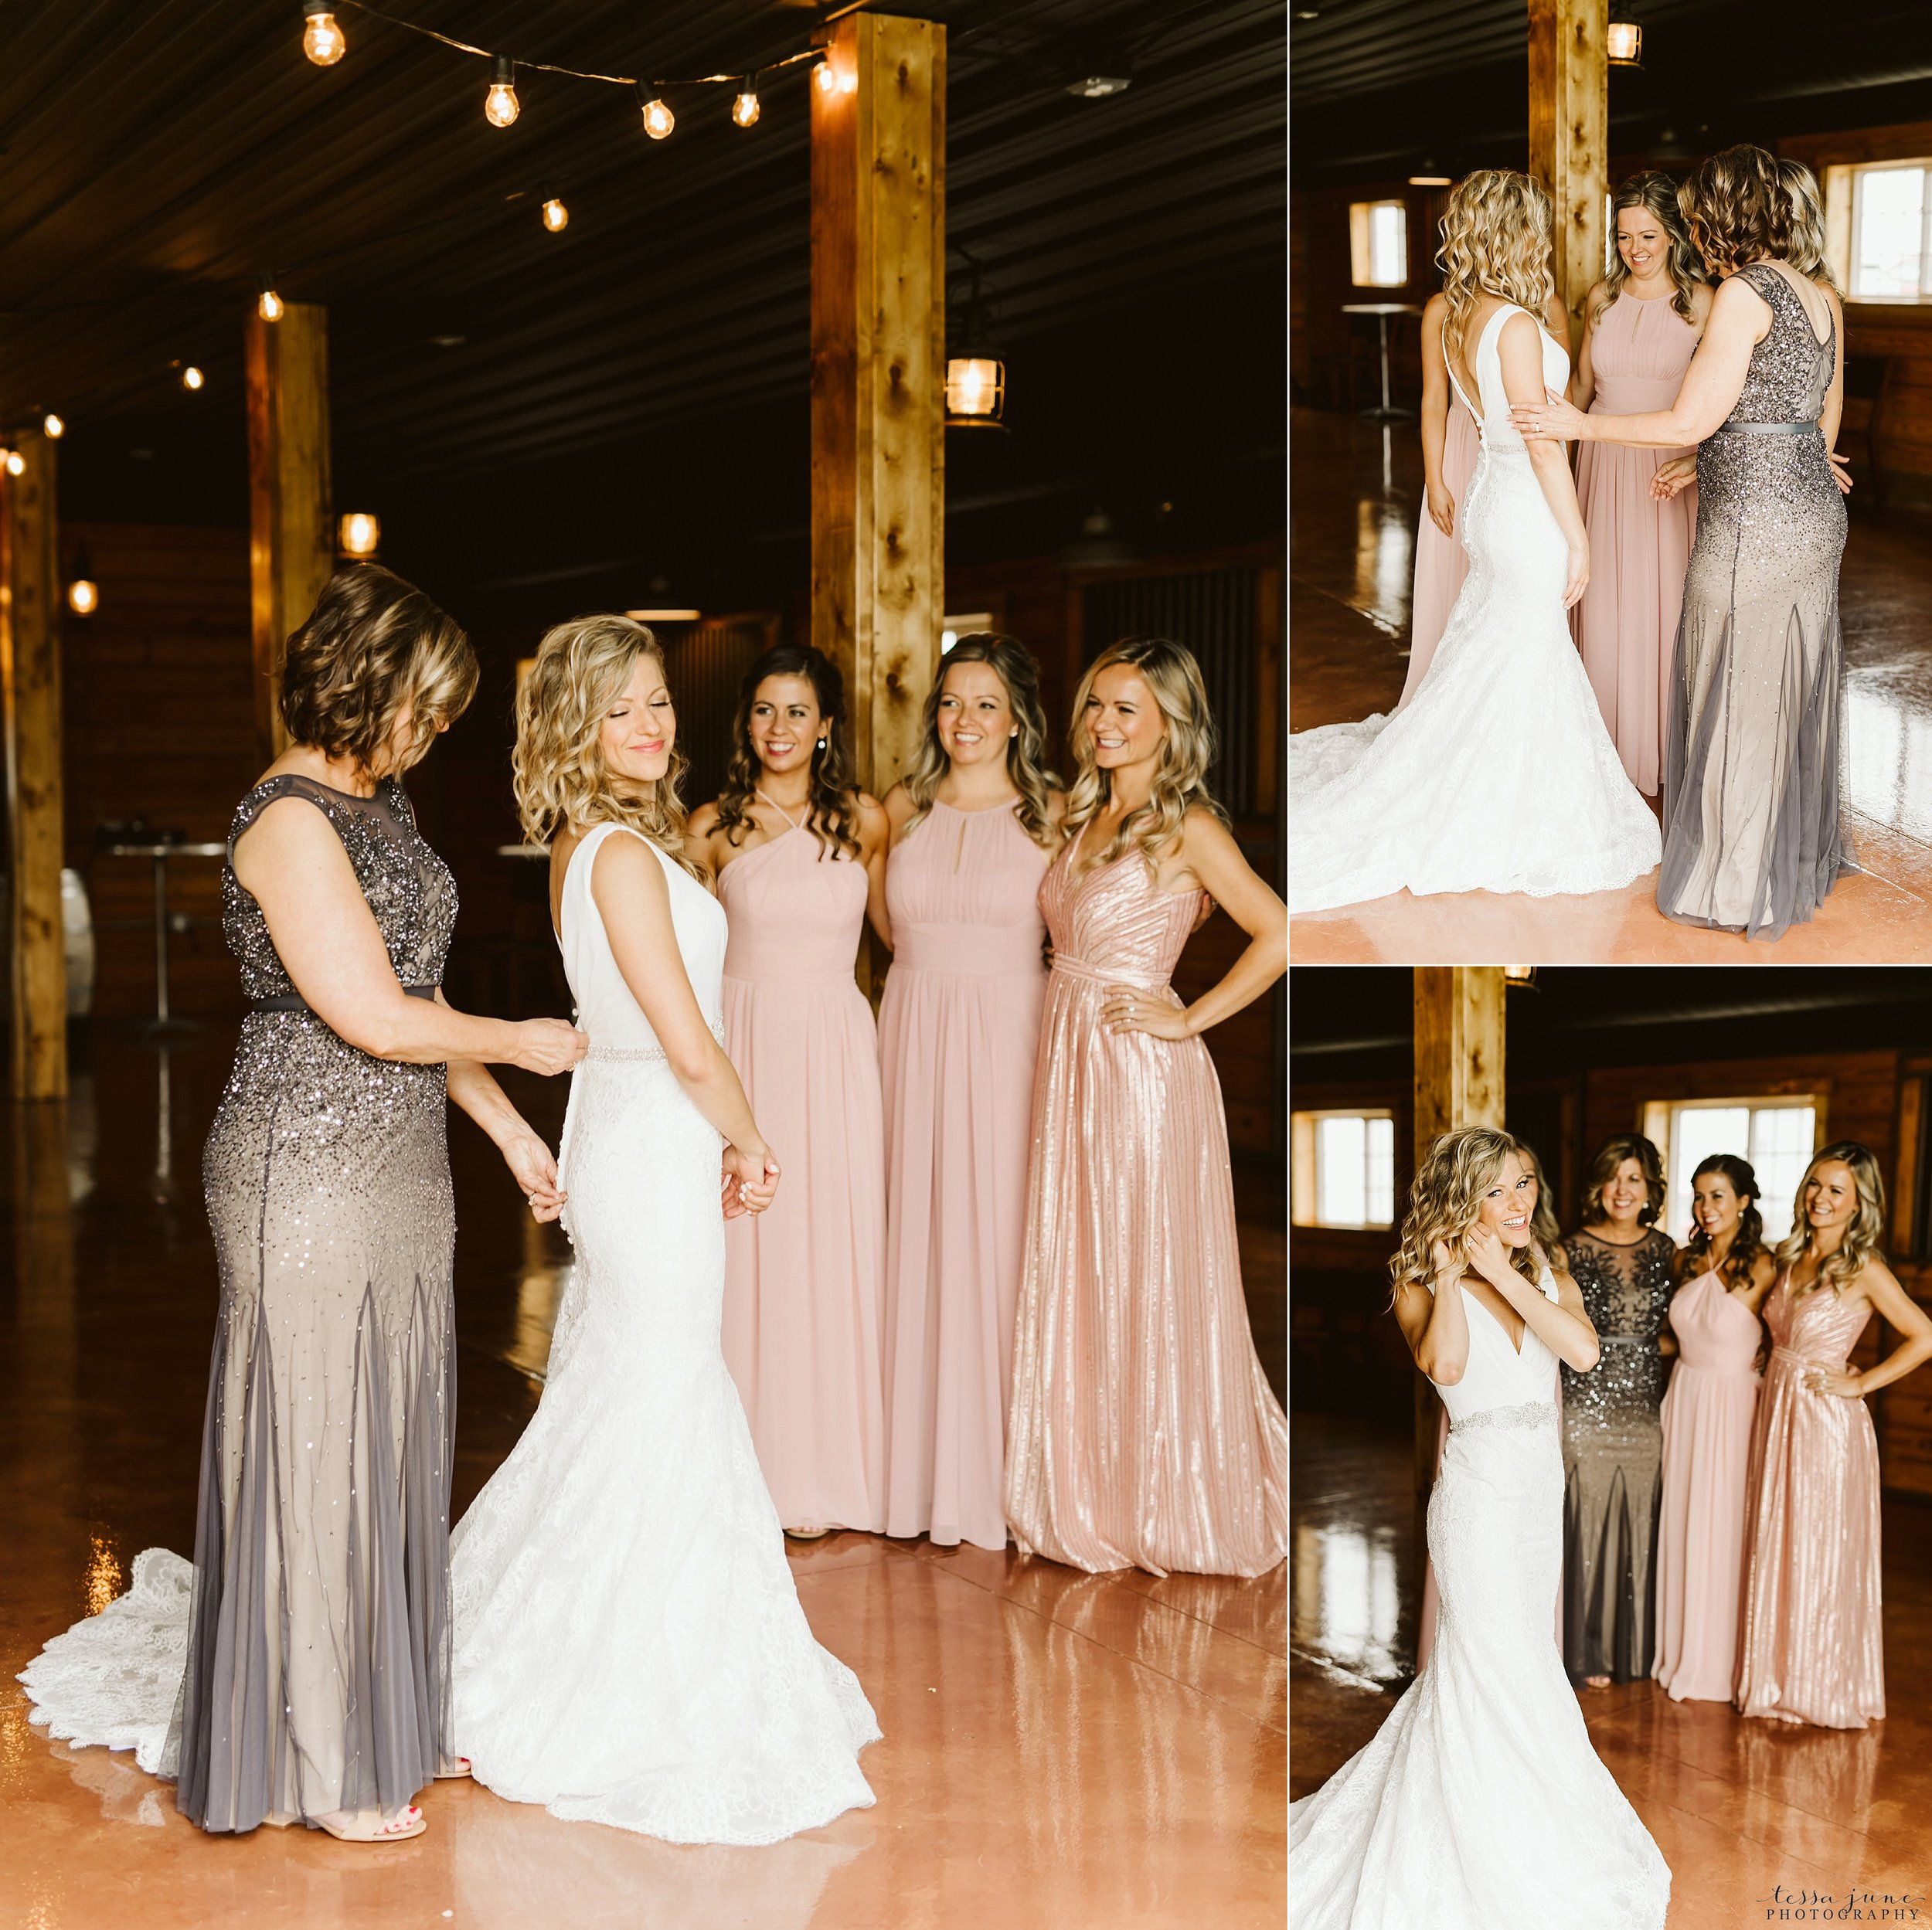 carlos-creek-winery-wedding-summer-pristine-floral-blush-pink-navy-alexandria-minnesota-27.jpg